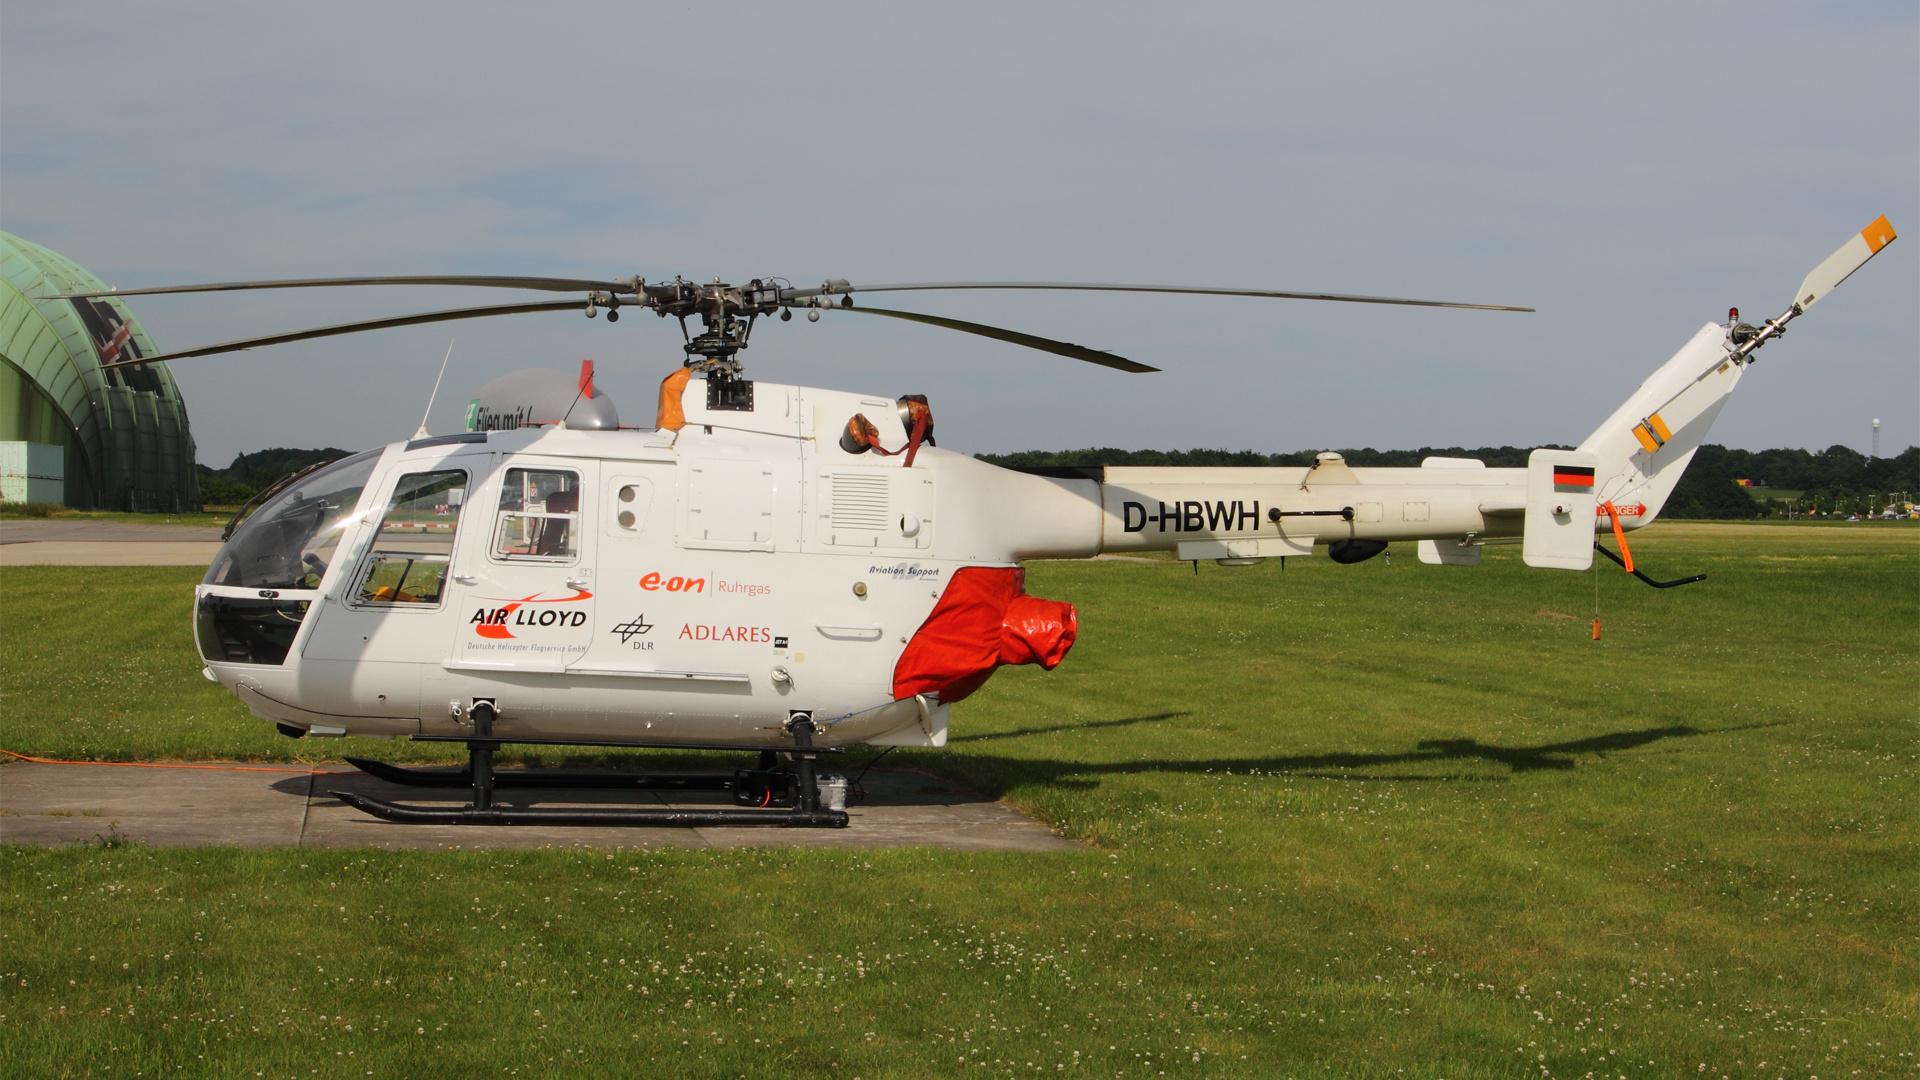 D-HBWH-1 BO105 ESS 201006